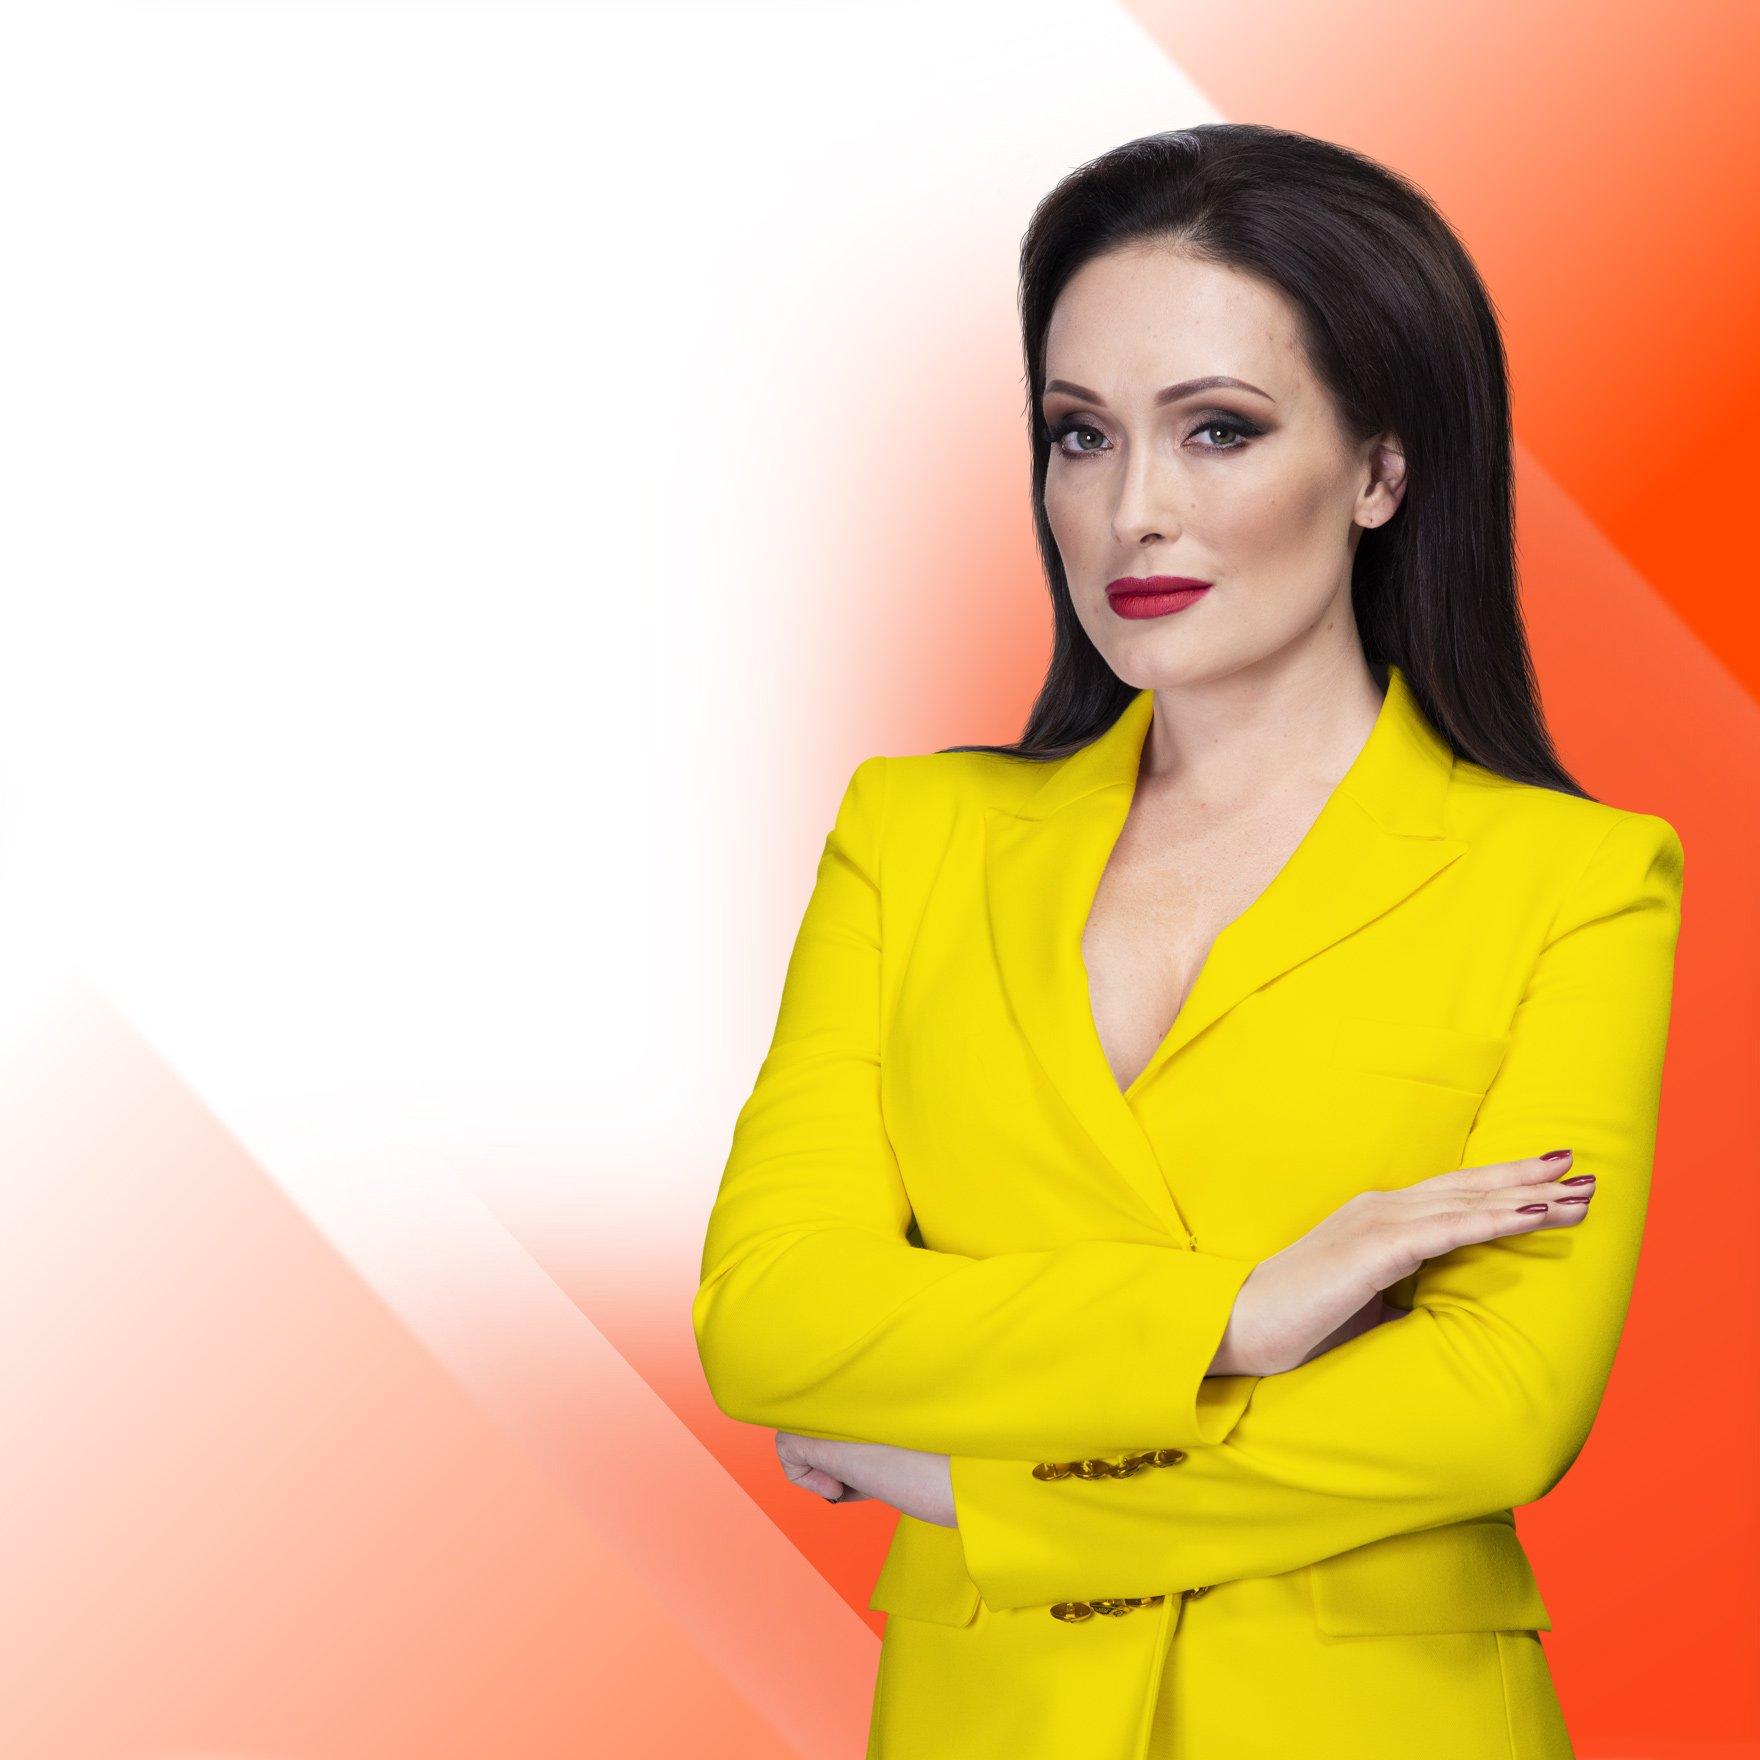 Елена Крайт